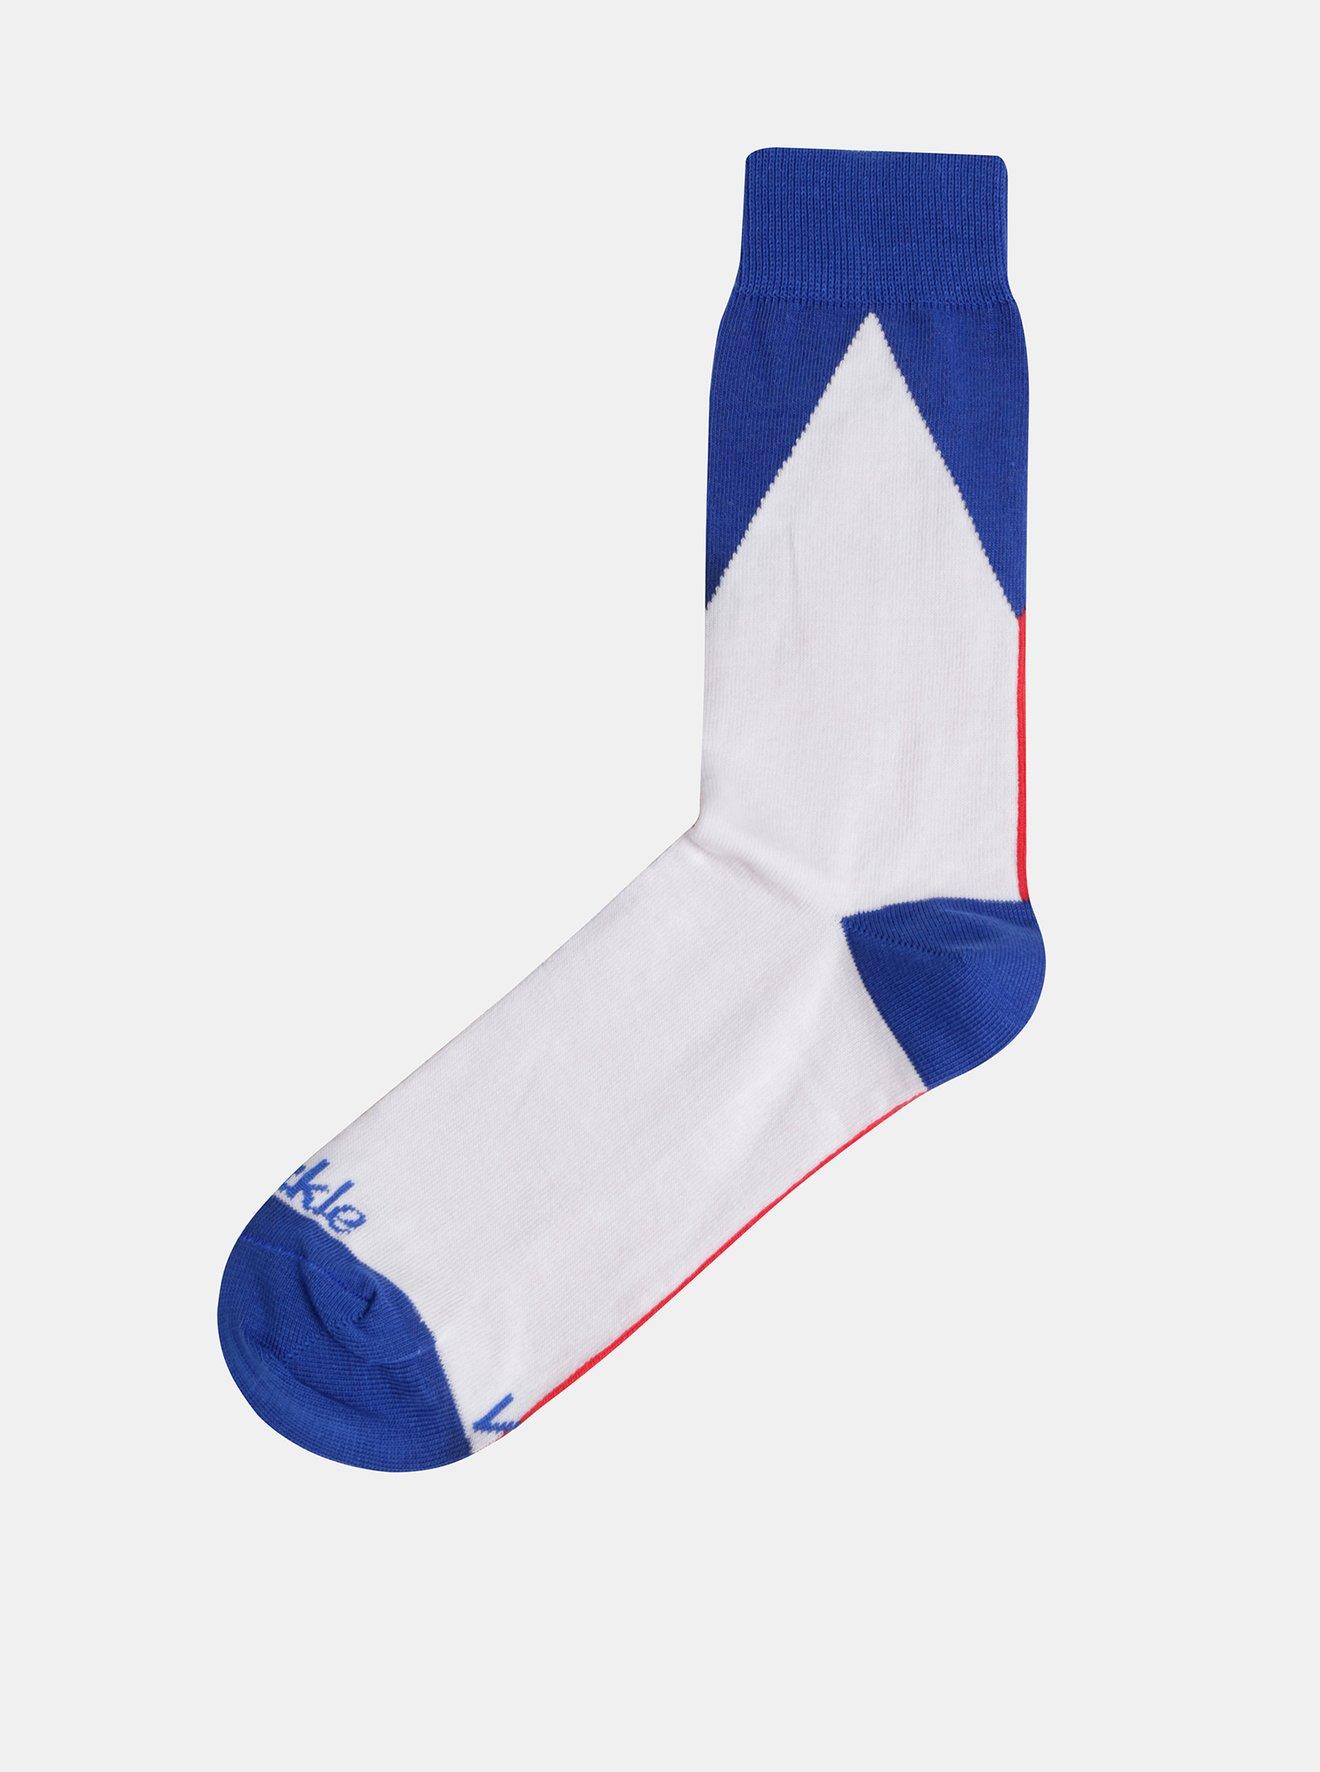 Bílo-modré ponožky Fusakle Vlajka